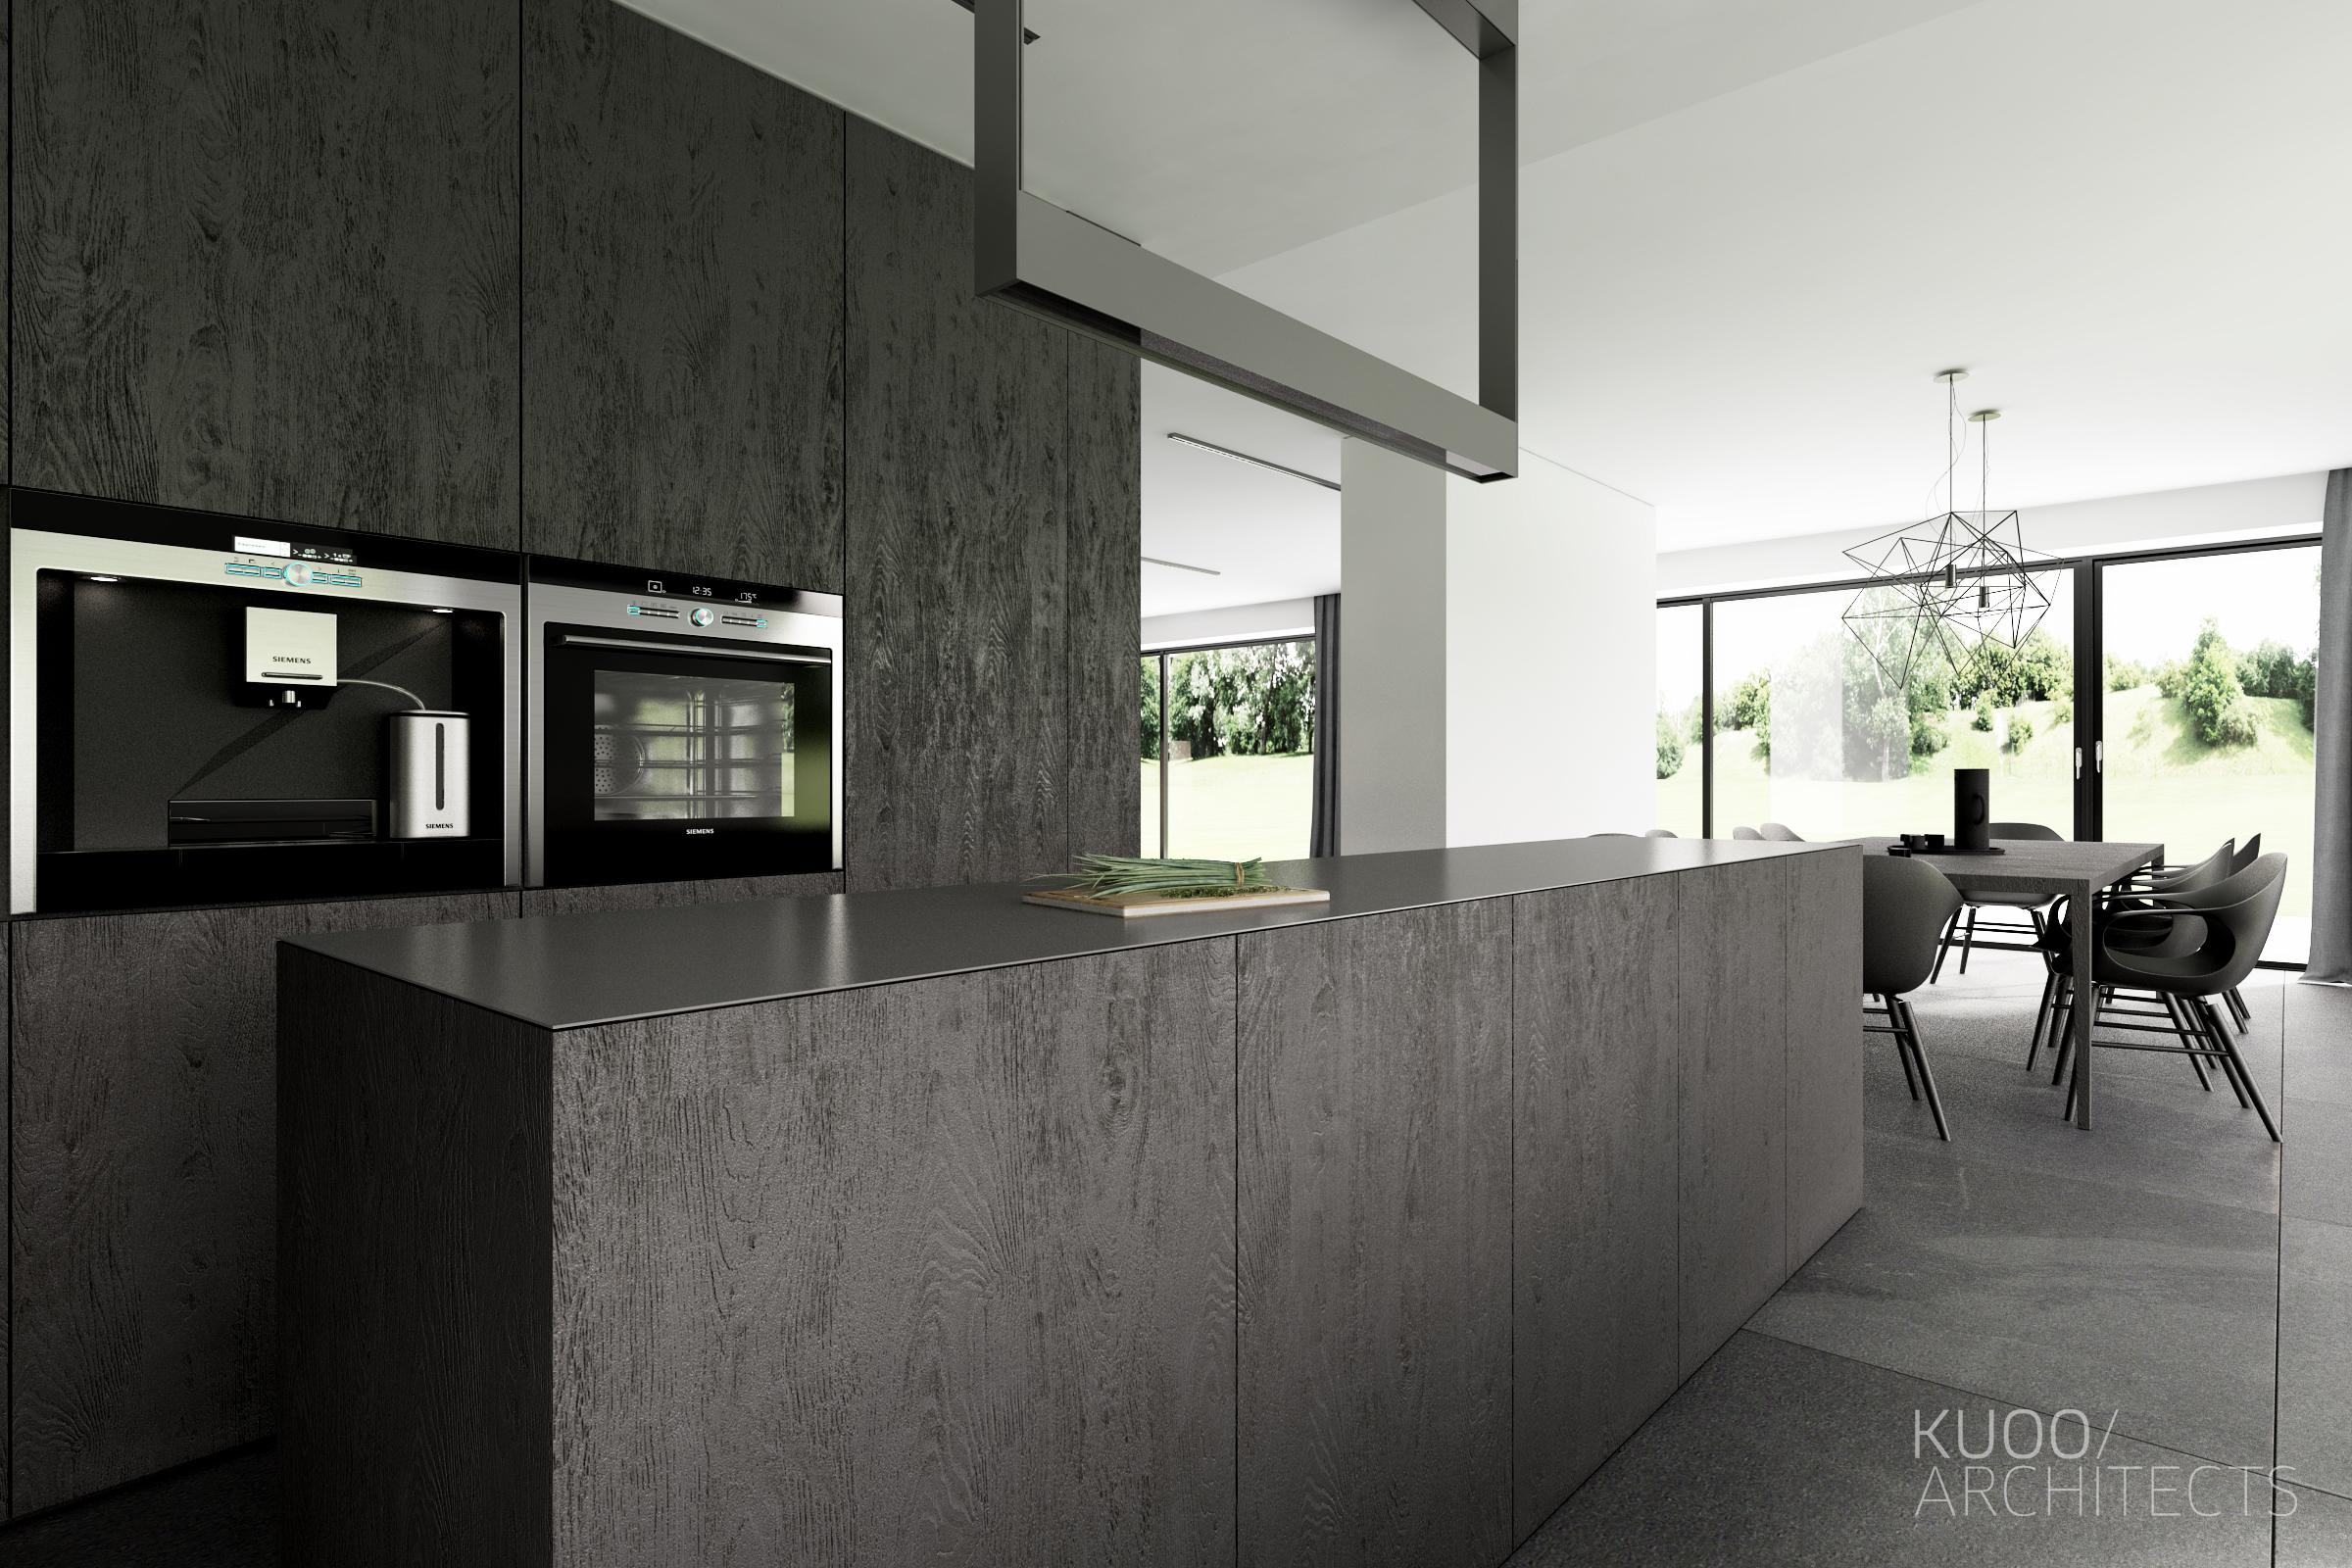 kuoo_architects_interior_design_minimal_contemporary (3) logo